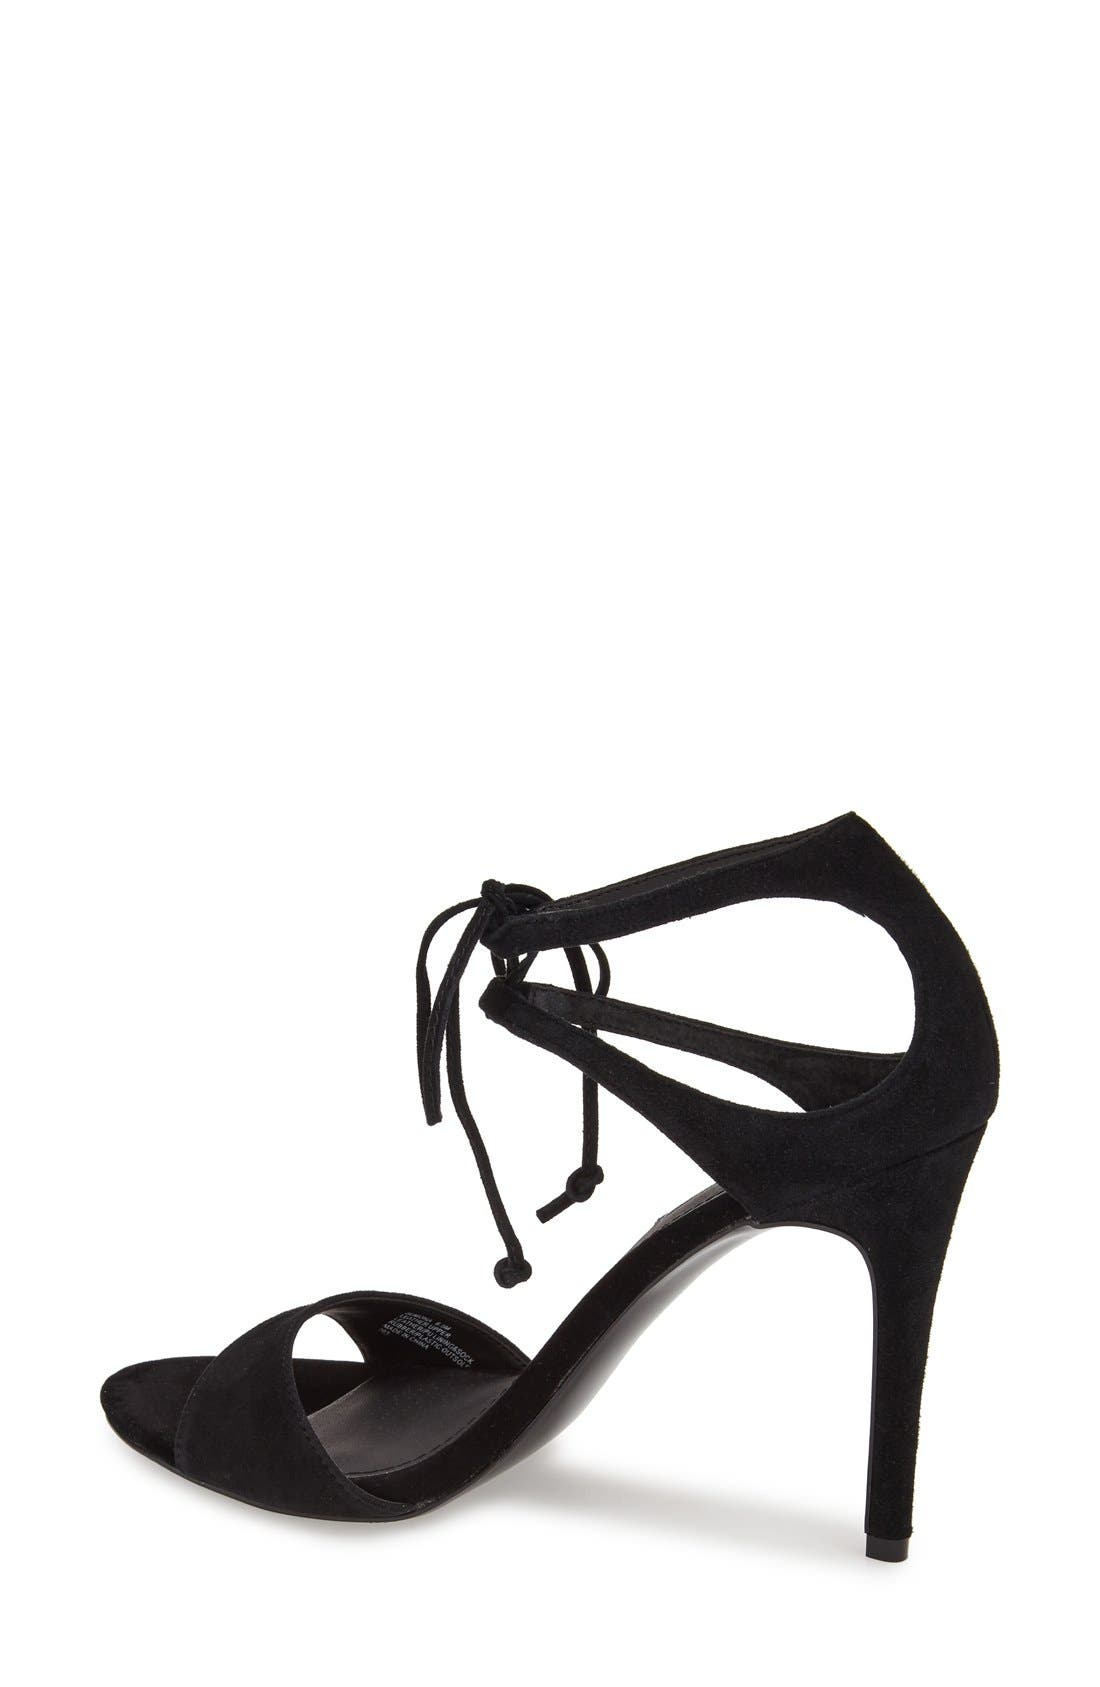 'Semona' Suede Ankle Strap Sandal,                             Alternate thumbnail 2, color,                             001